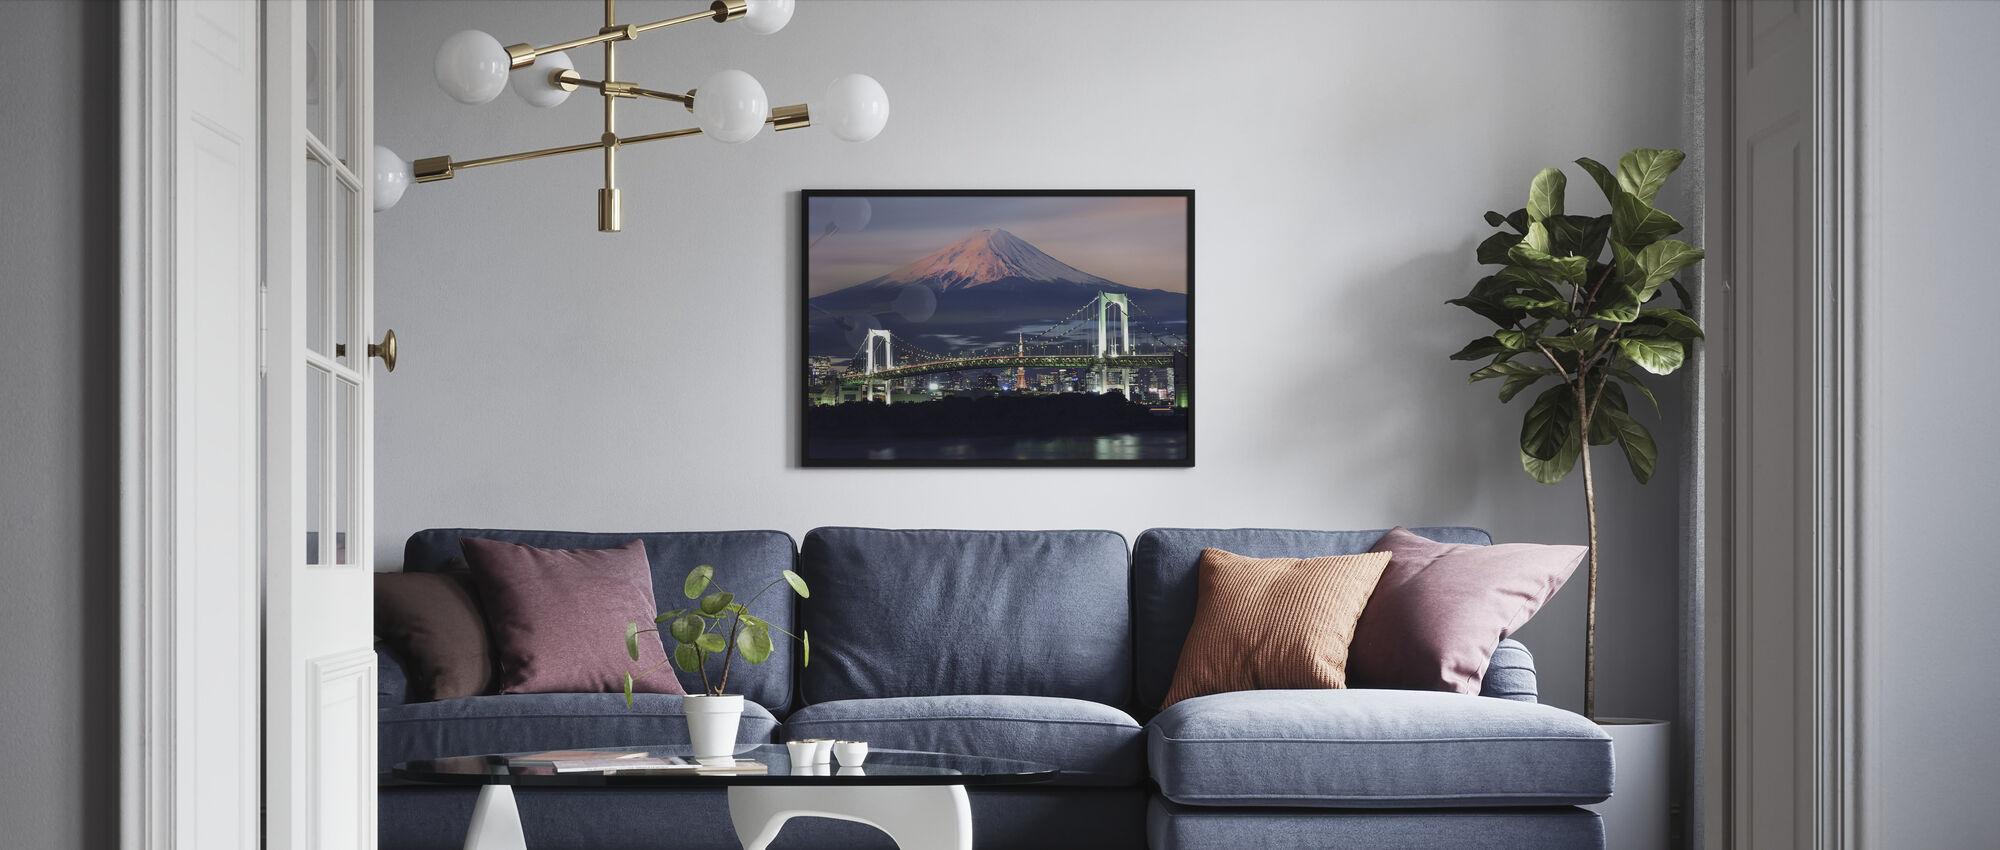 Rainbow Bridge with Mt Fuji - Framed print - Living Room